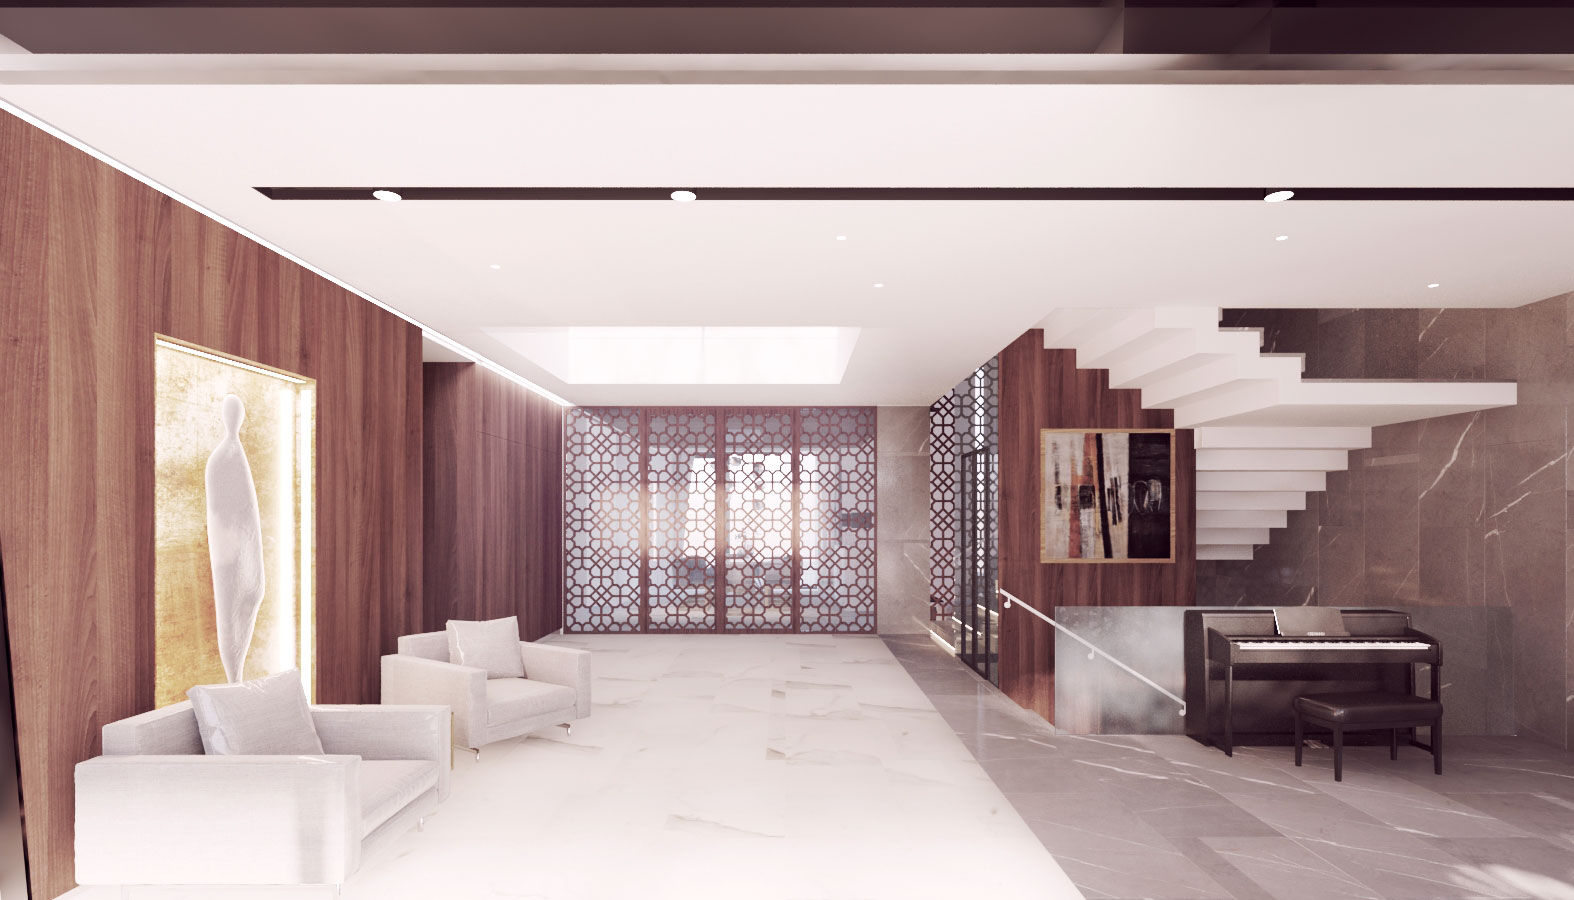 https://nbc-arhitect.ro/wp-content/uploads/2020/10/NBC-Arhitect-_-residences-_-Mogo-Villa-_-Romania-_-interior-view_22.jpg